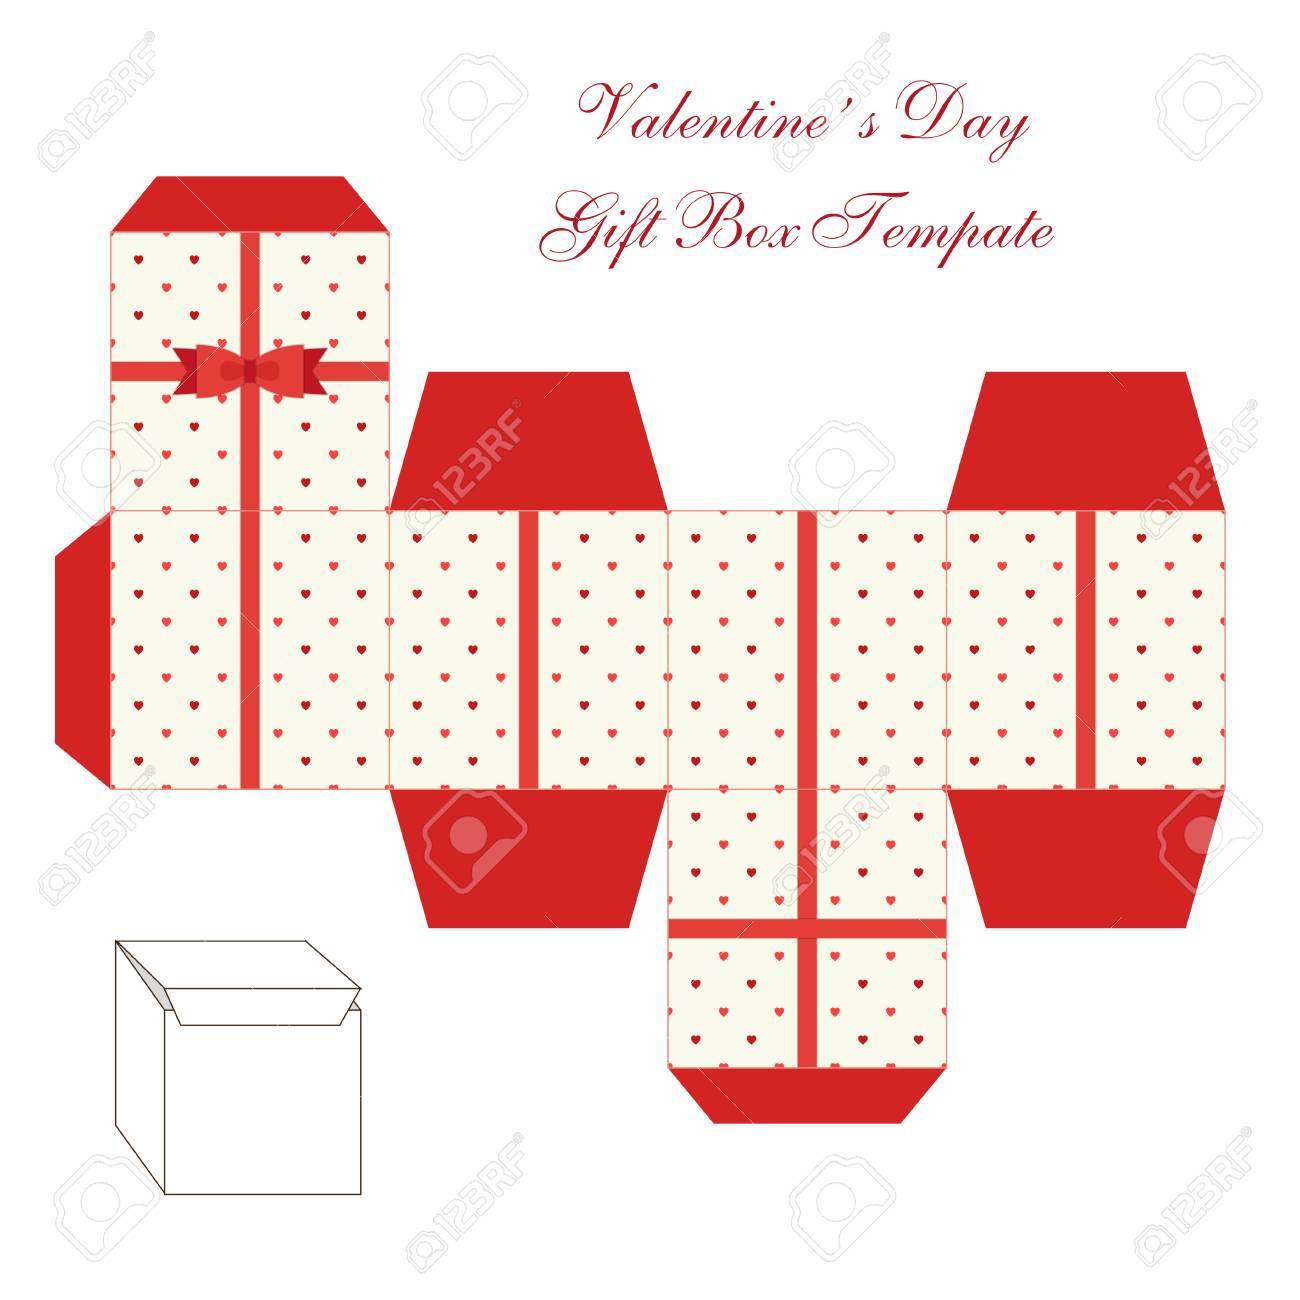 Cute Retro Square Gift Box Template With Hearts Ornament To Print ...